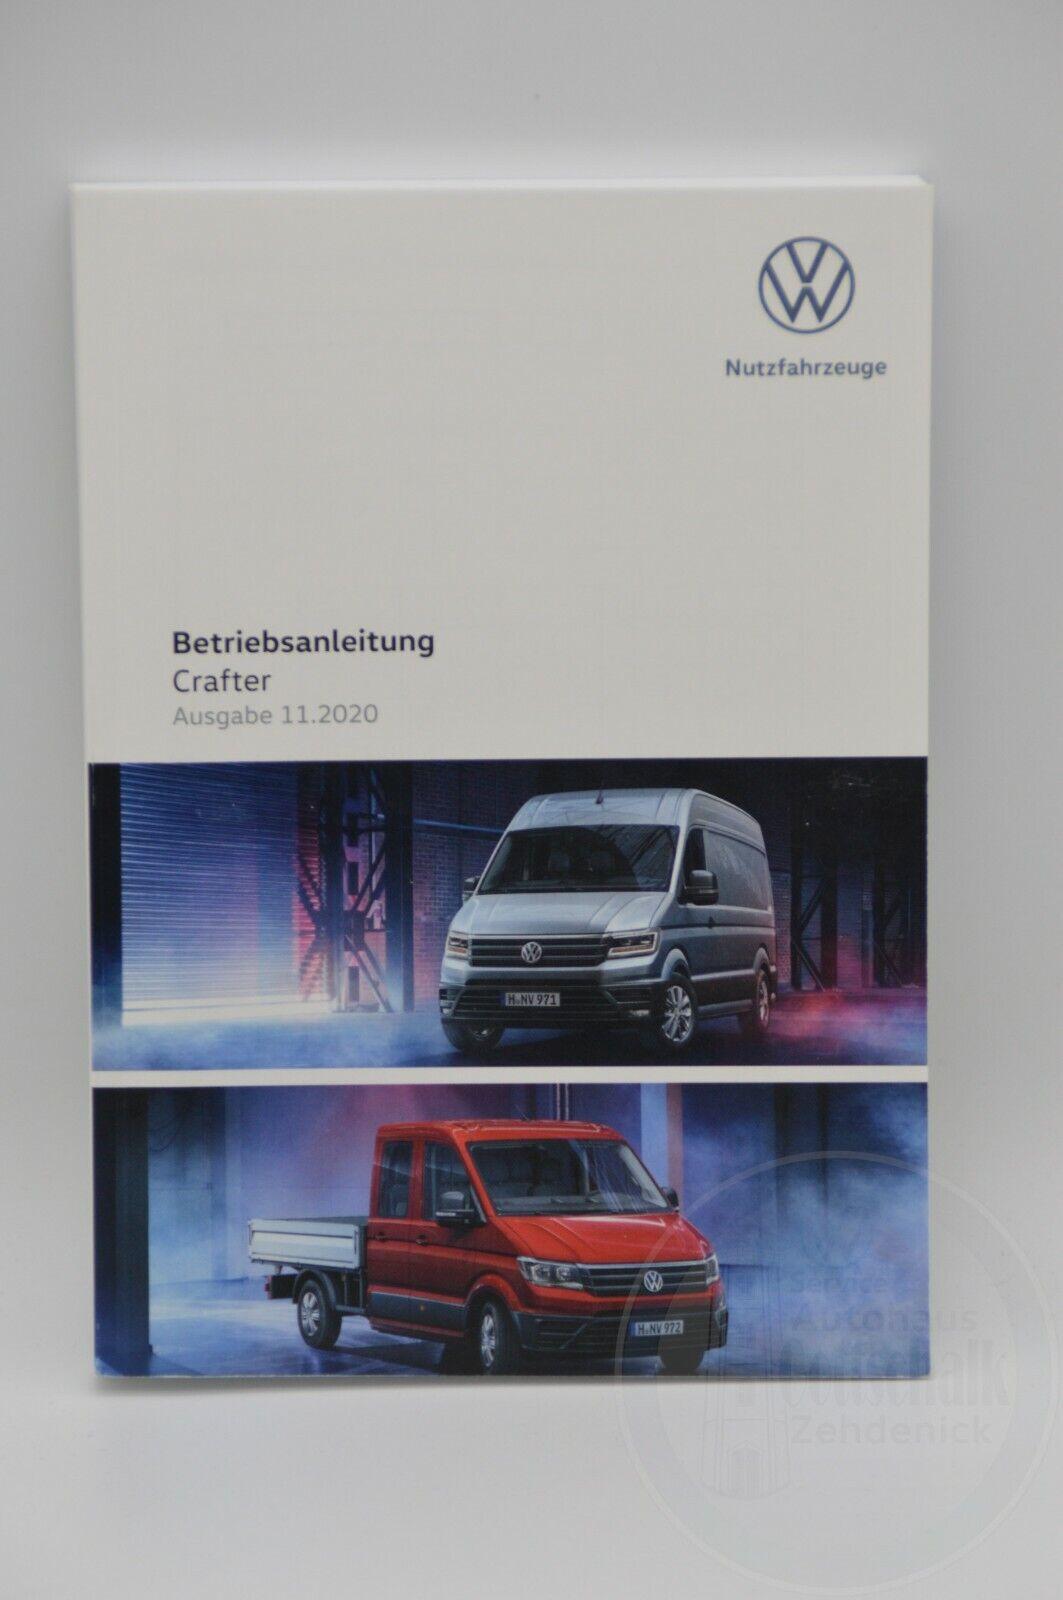 Original VW Crafter Bedienungsanleitung Betriebsanleitung Handbuch Bordbuch 11/2020 7C0012705AK